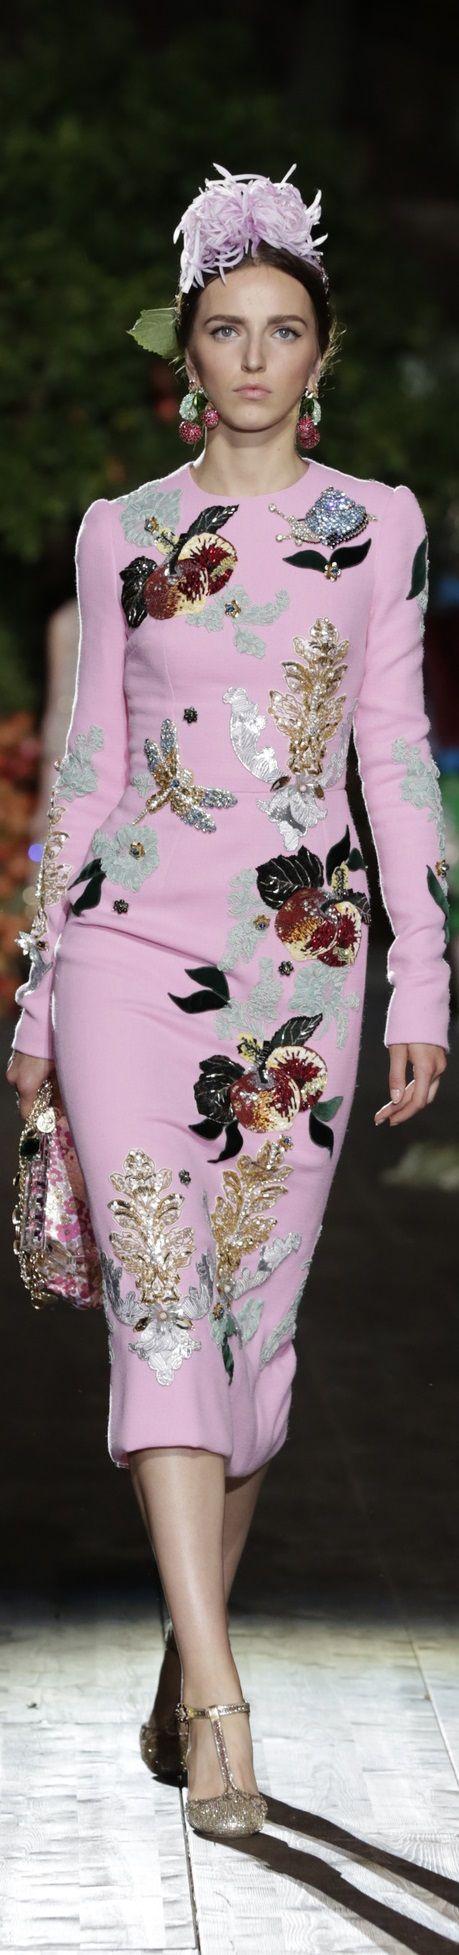 best dress images on pinterest